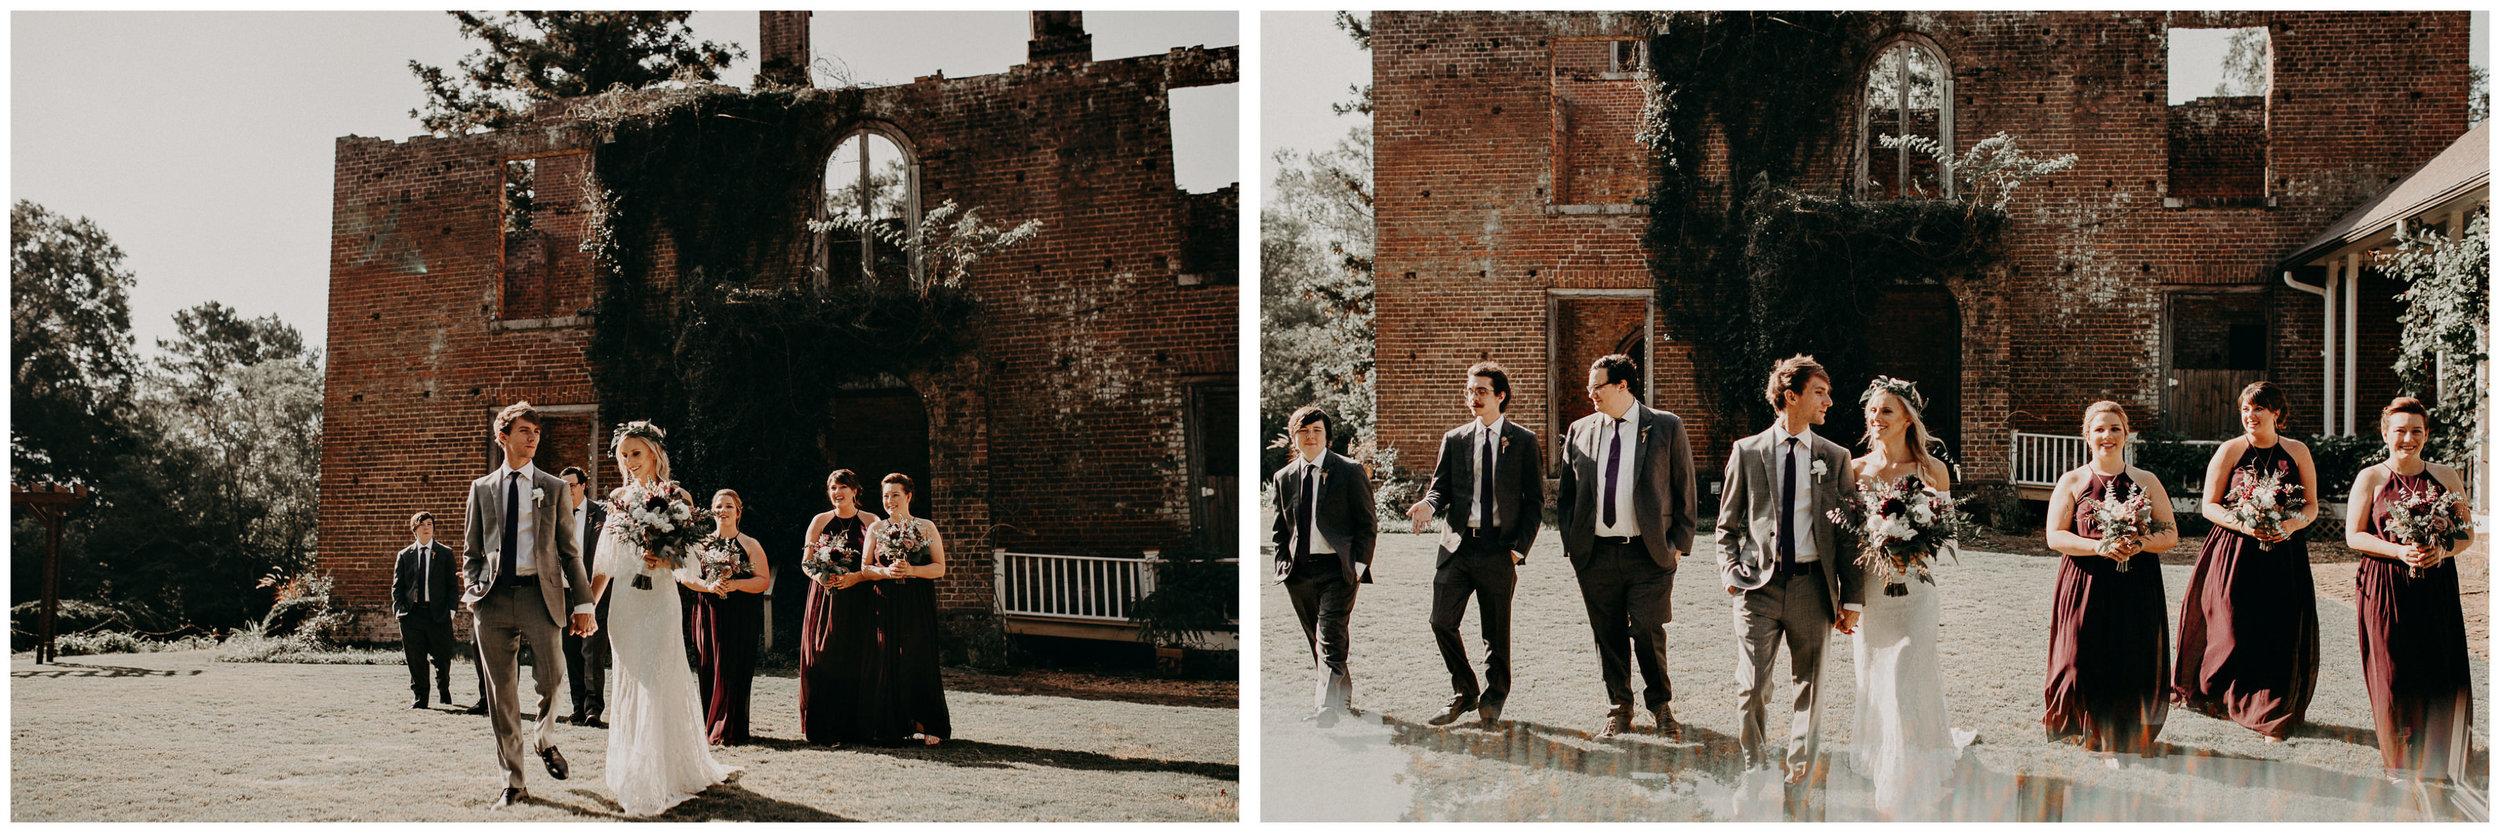 34 - Barnsley Gardens Wedding - Wedding Party portraits - First Look .jpg